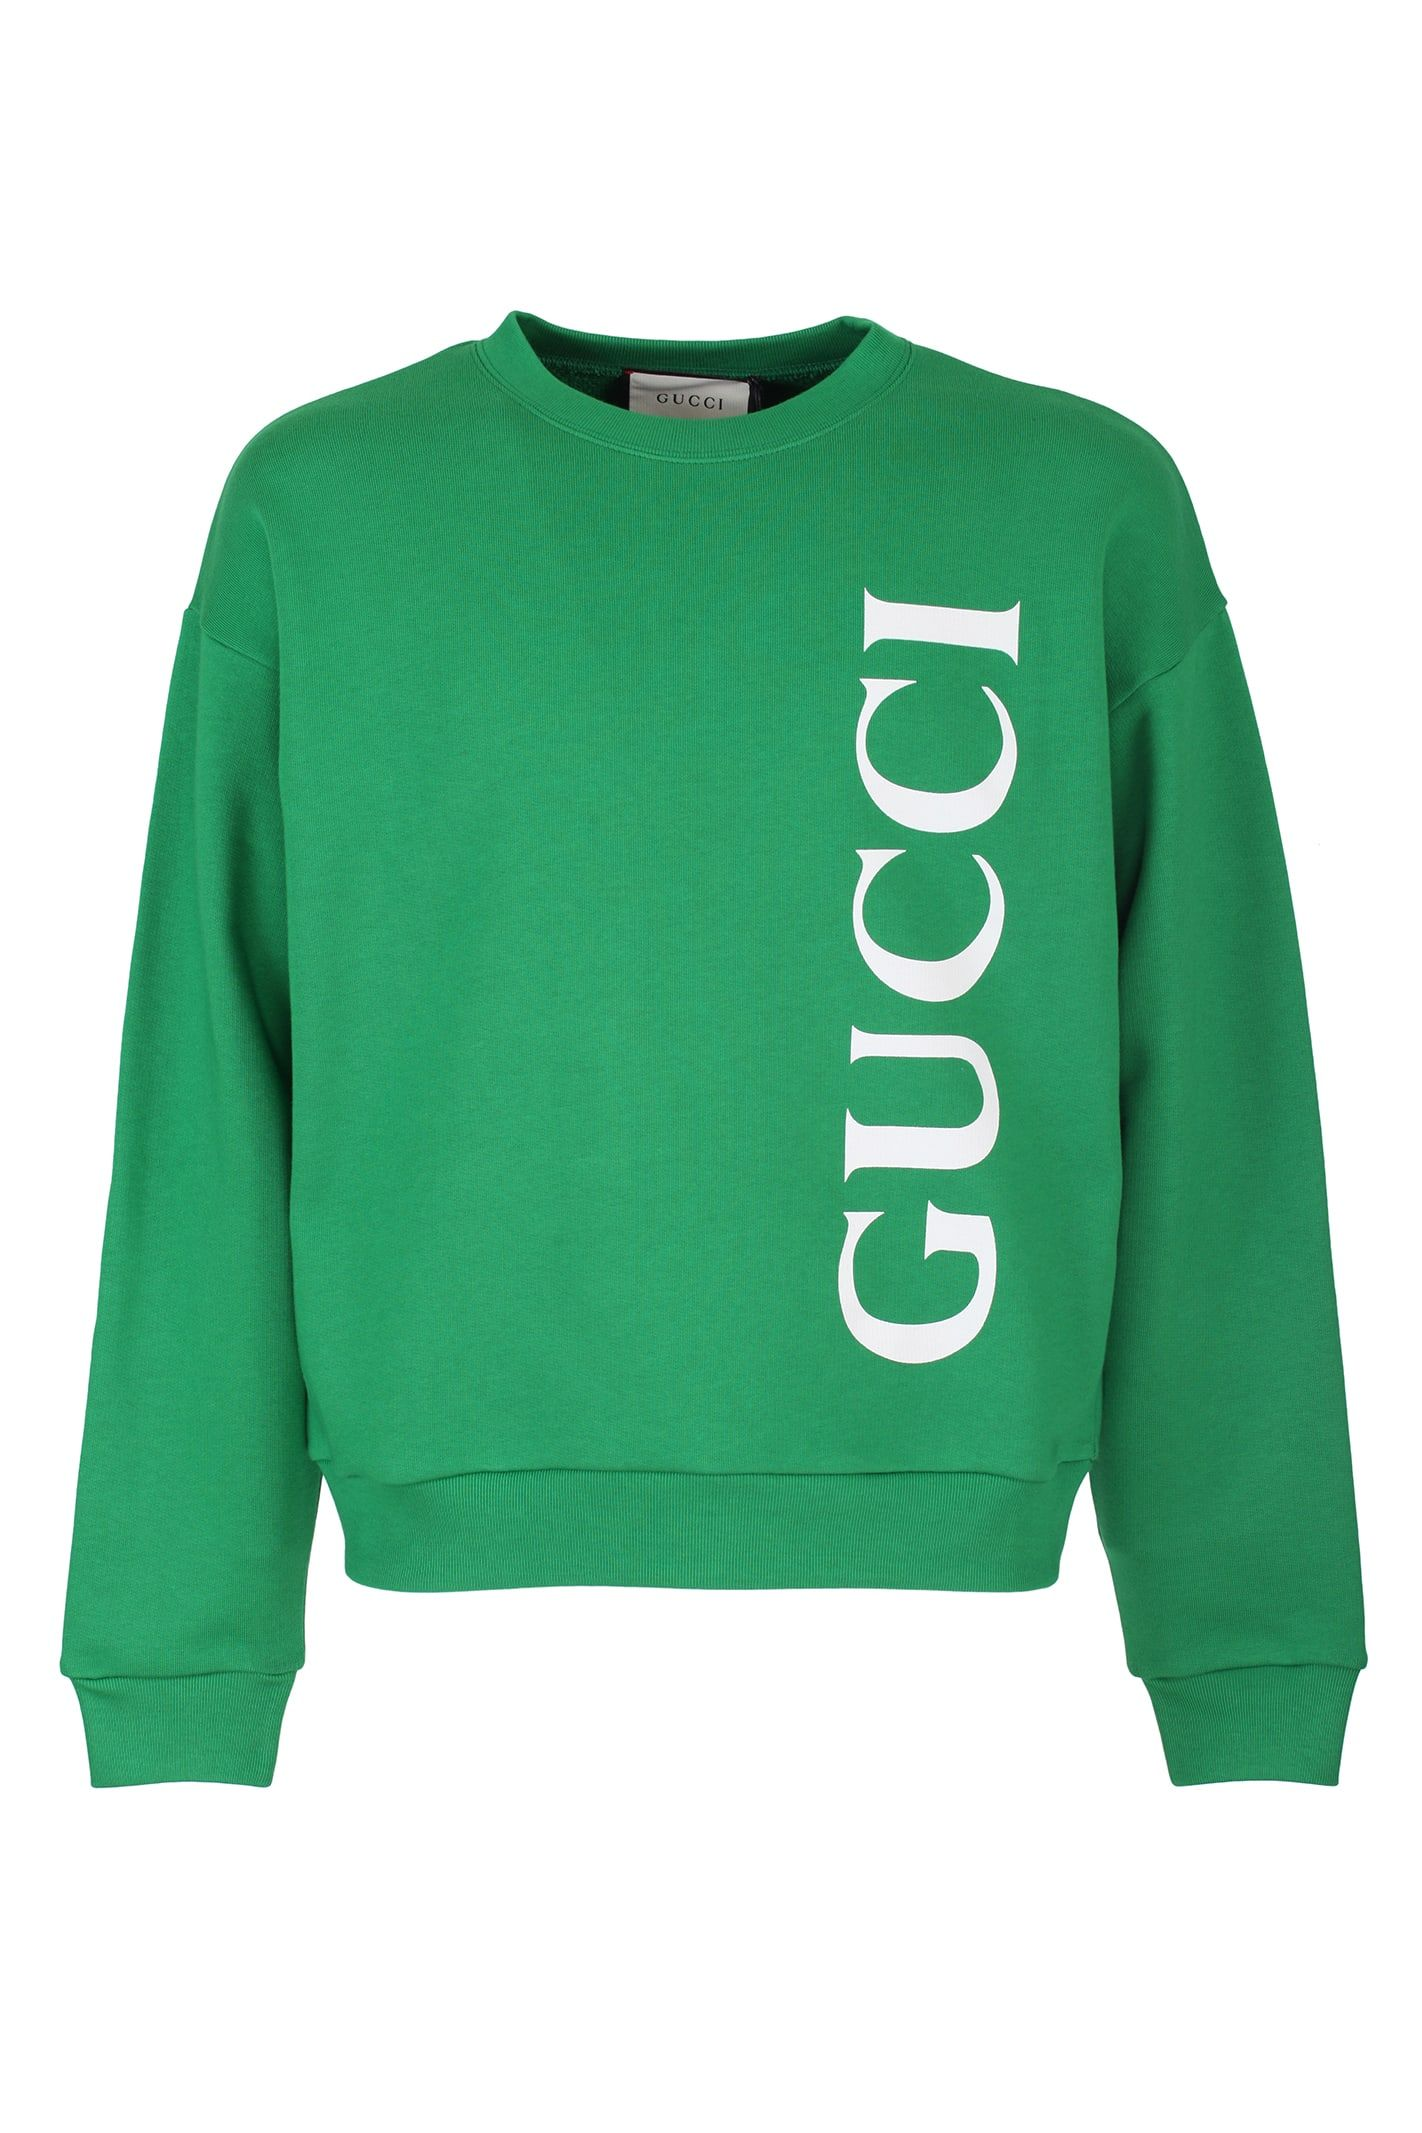 Best Price On The Market At Italist Gucci Gucci Green Cotton Jersey Sweatshirt Sweatshirts Sweatshirt Designs School Shirt Designs [ 2133 x 1422 Pixel ]